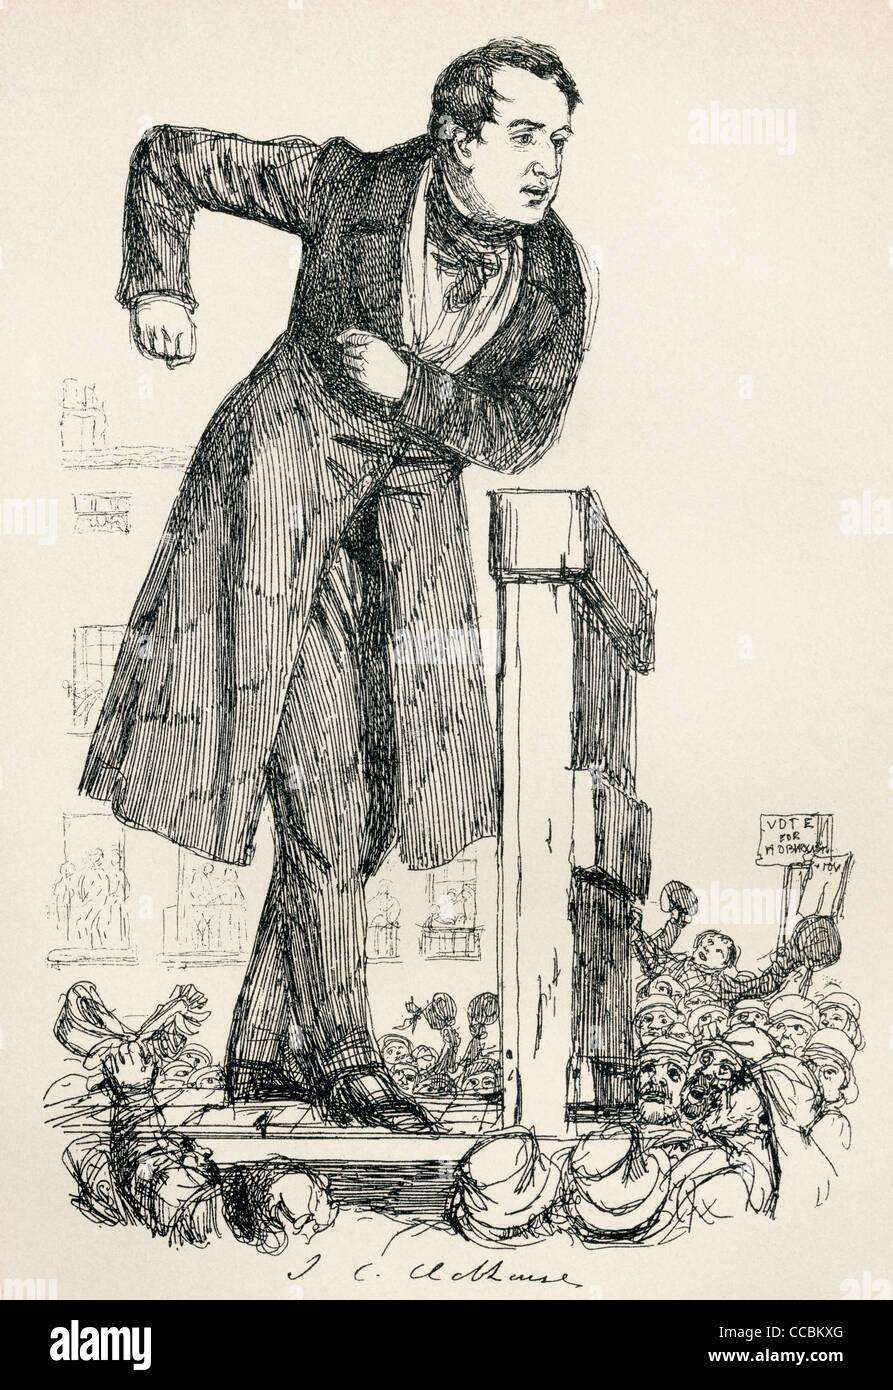 John Cam Hobhouse, 1st Baron Broughton, 1786 – 1869, aka Sir John Hobhouse. British politician and memoirist. - Stock Image